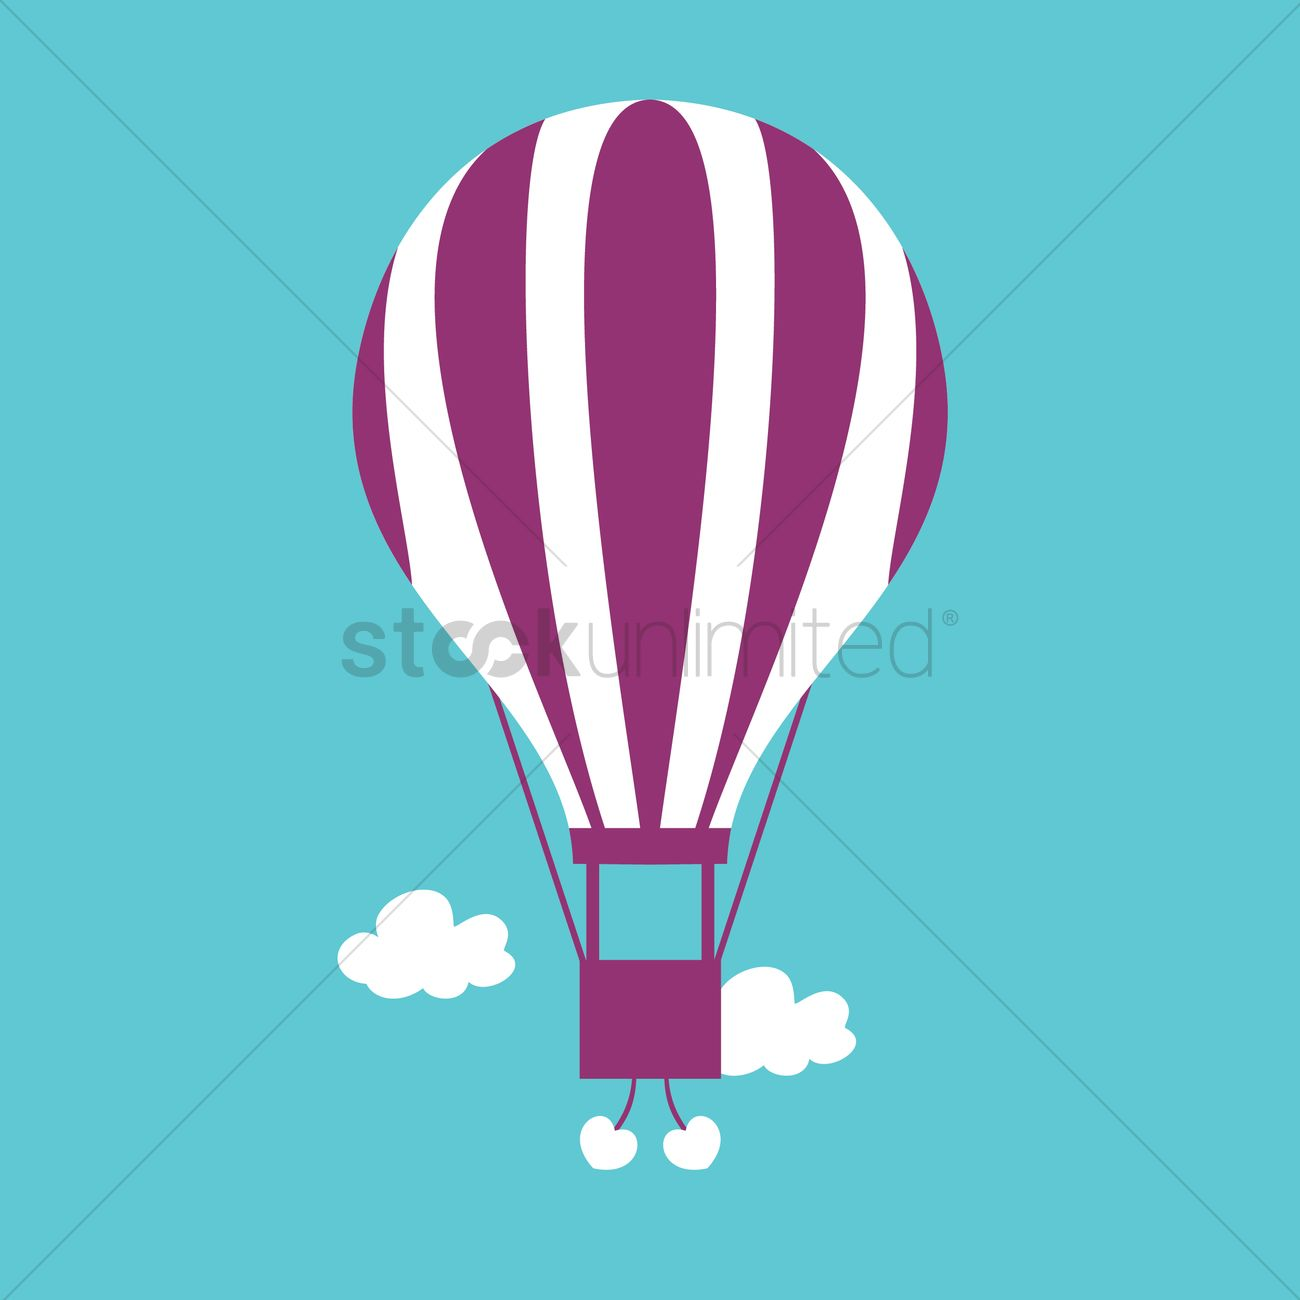 basket parachute vector image 1340020 stockunlimited rh stockunlimited com parachute vector art parachute vector art